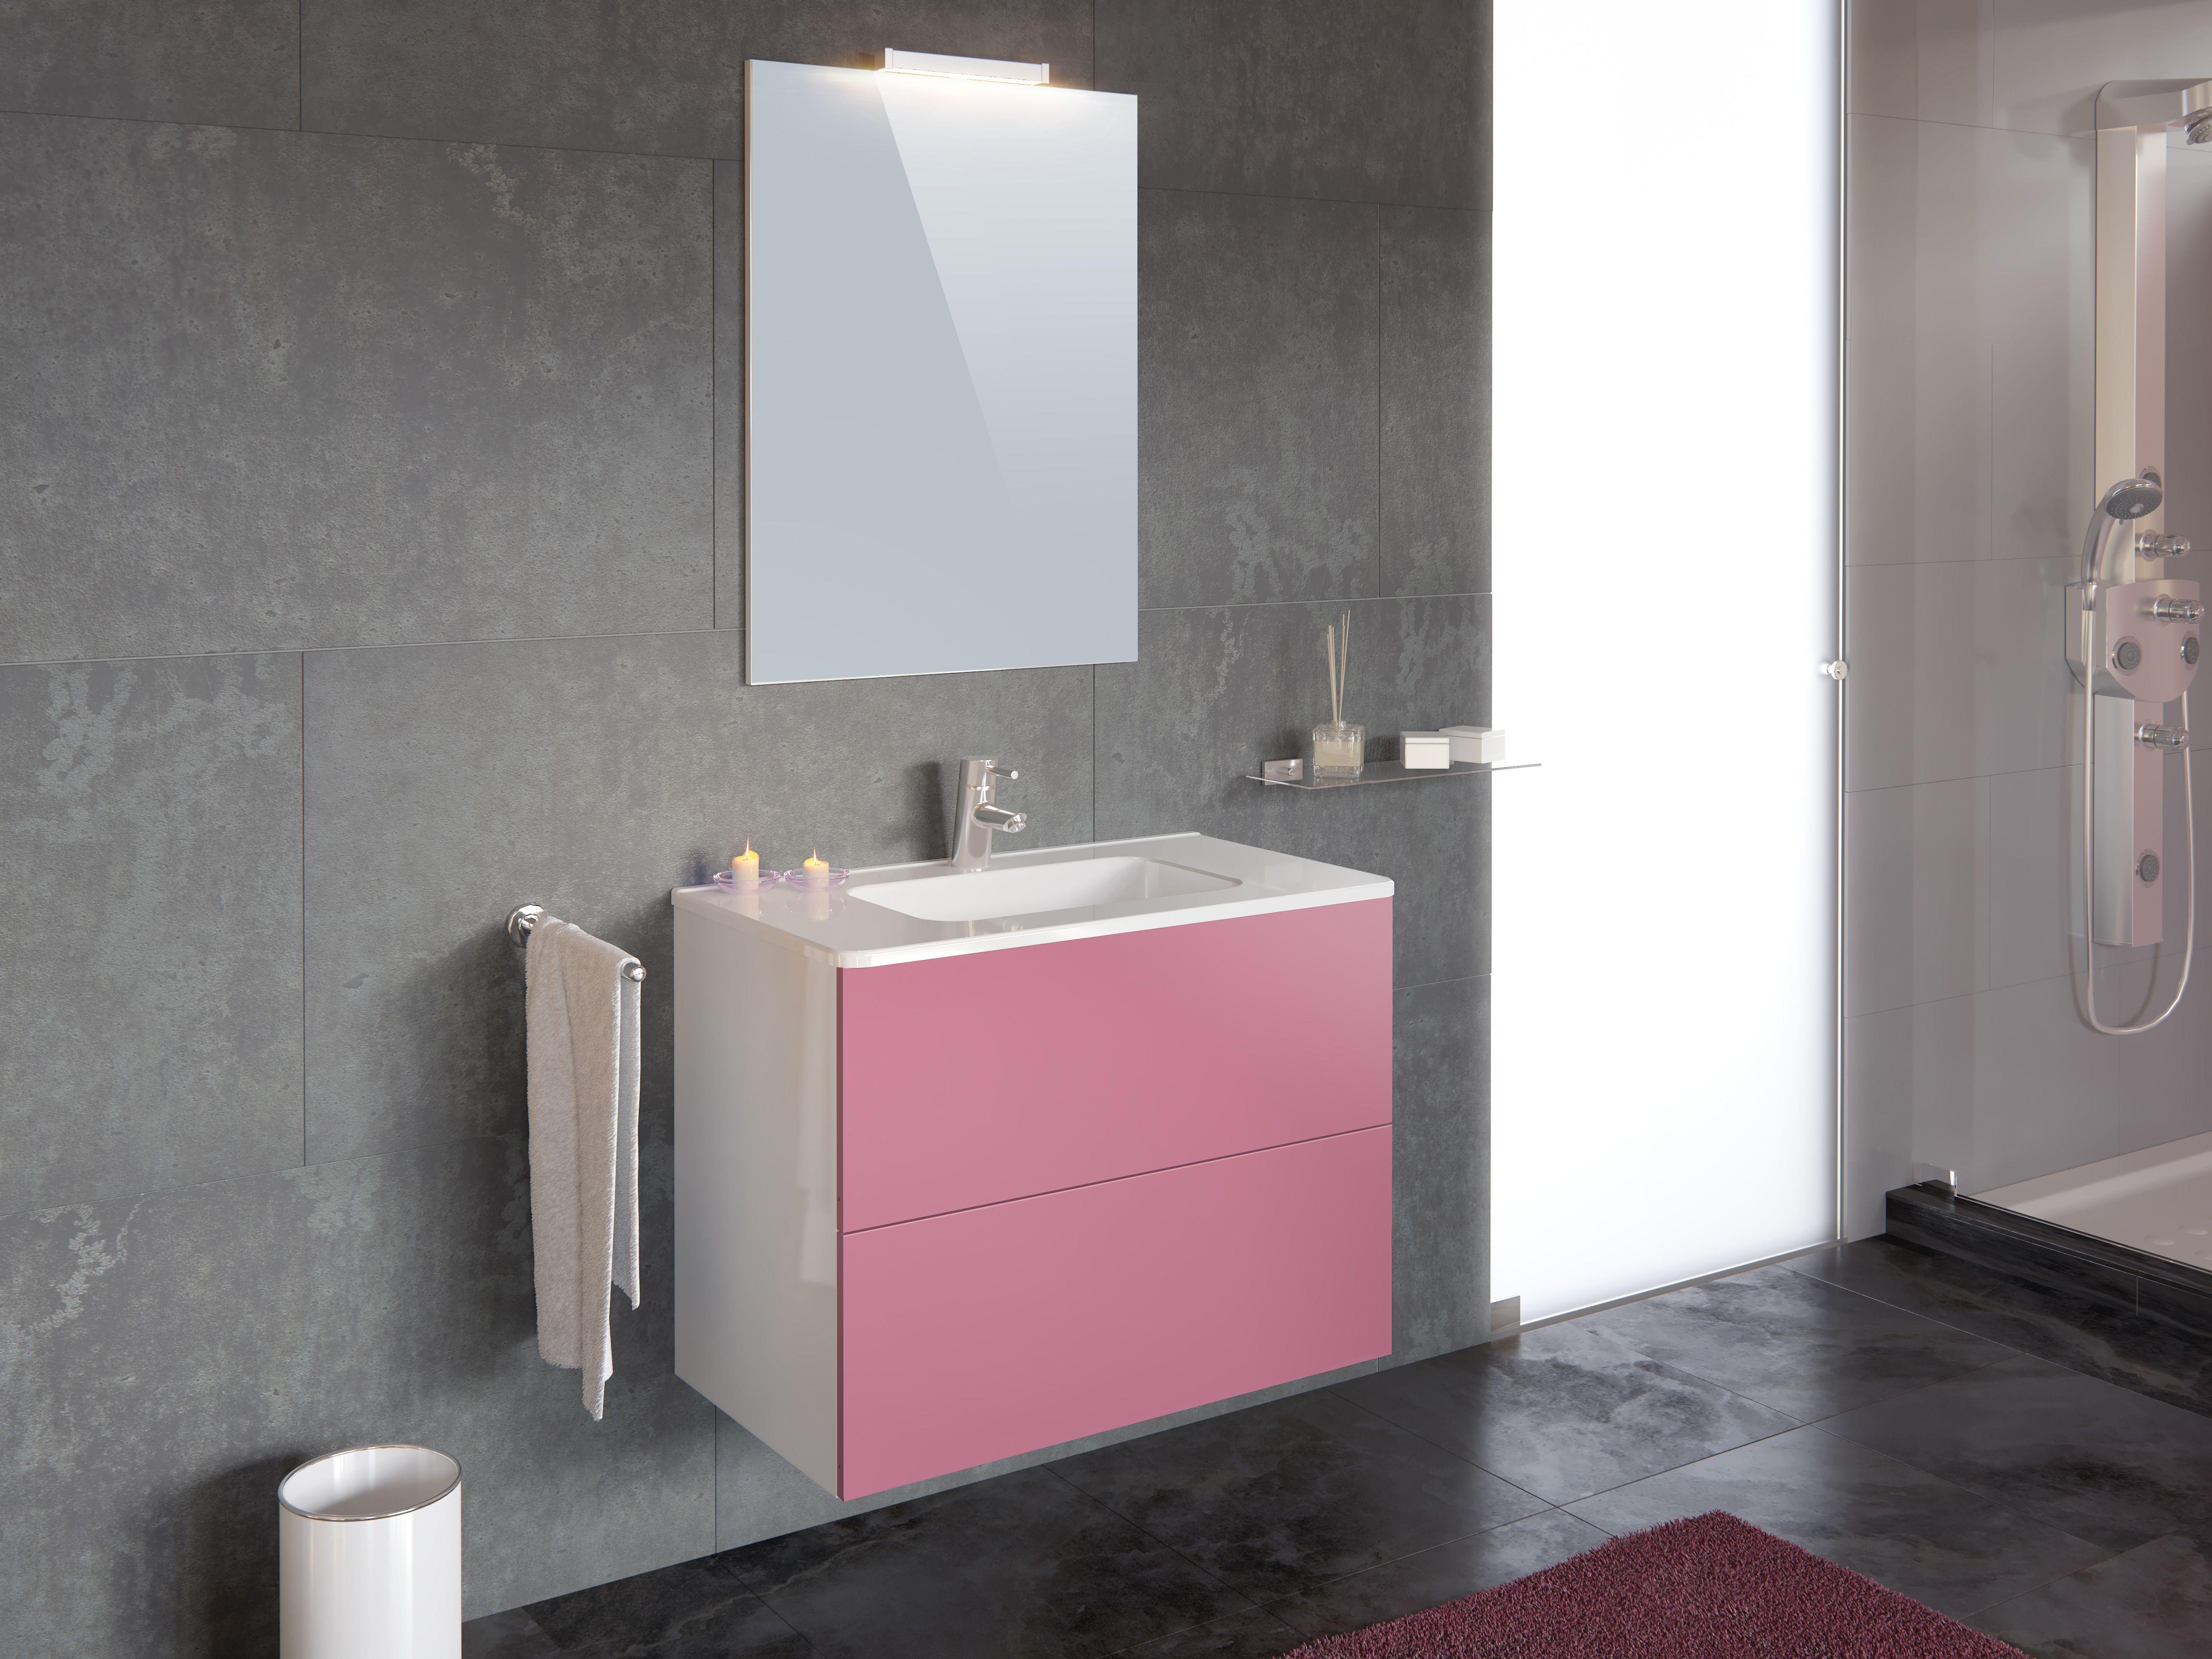 Ensemble de salle de bain TAHITI Rose